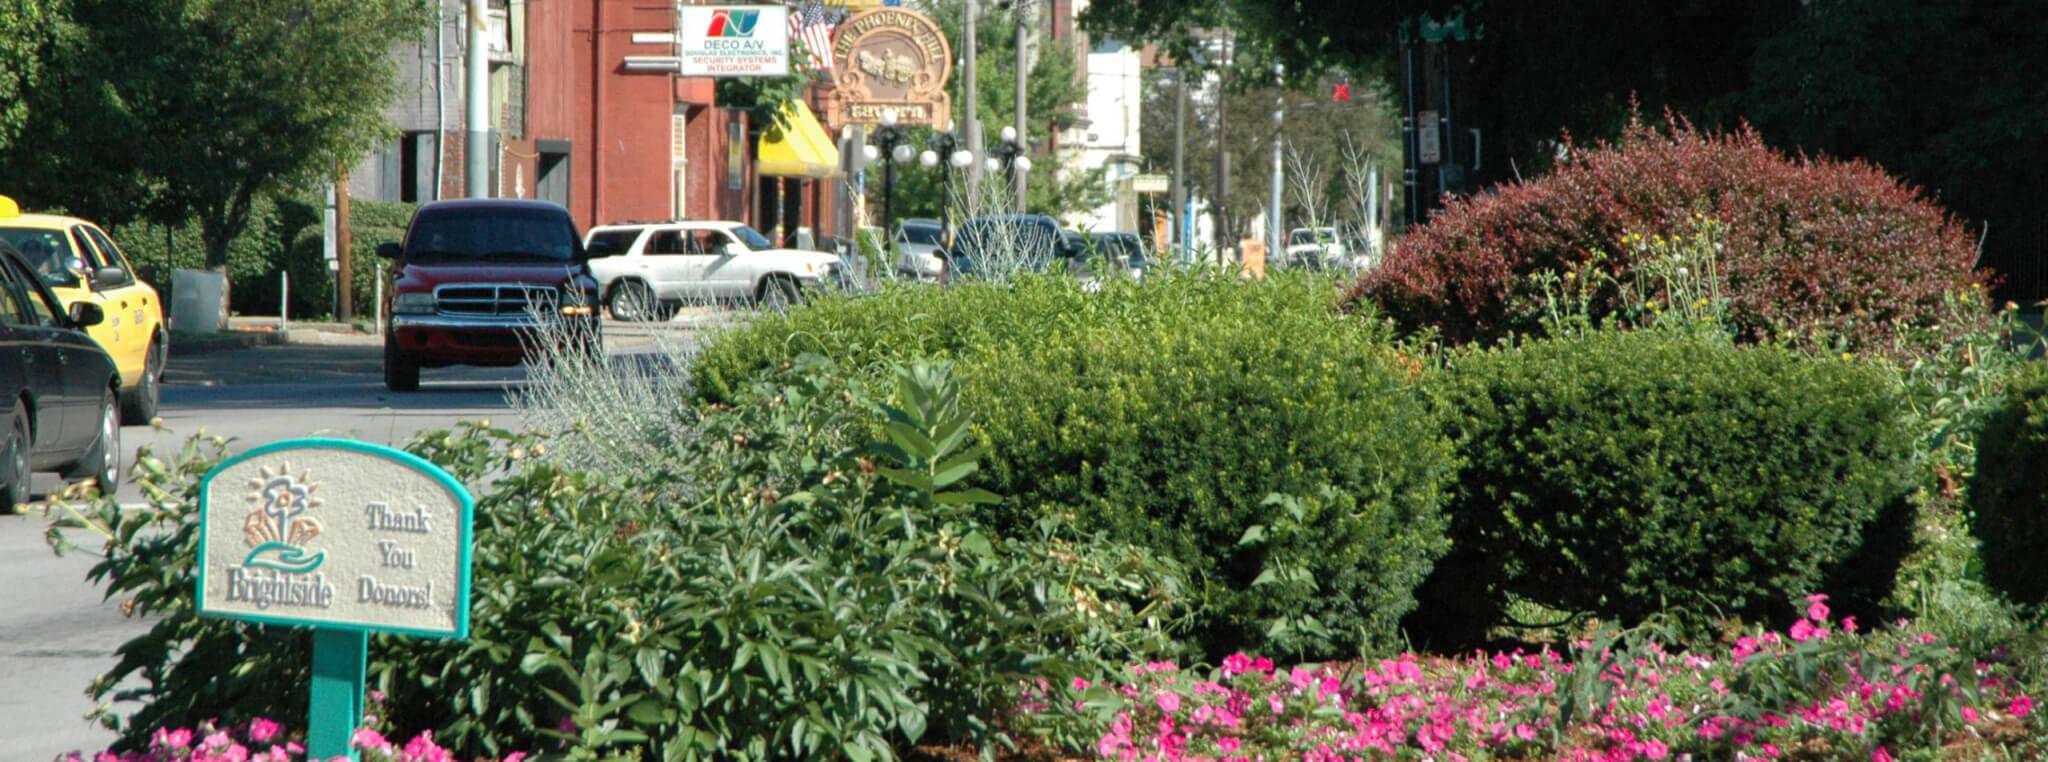 BrightSite Broadway Baxter Cherokee intersection